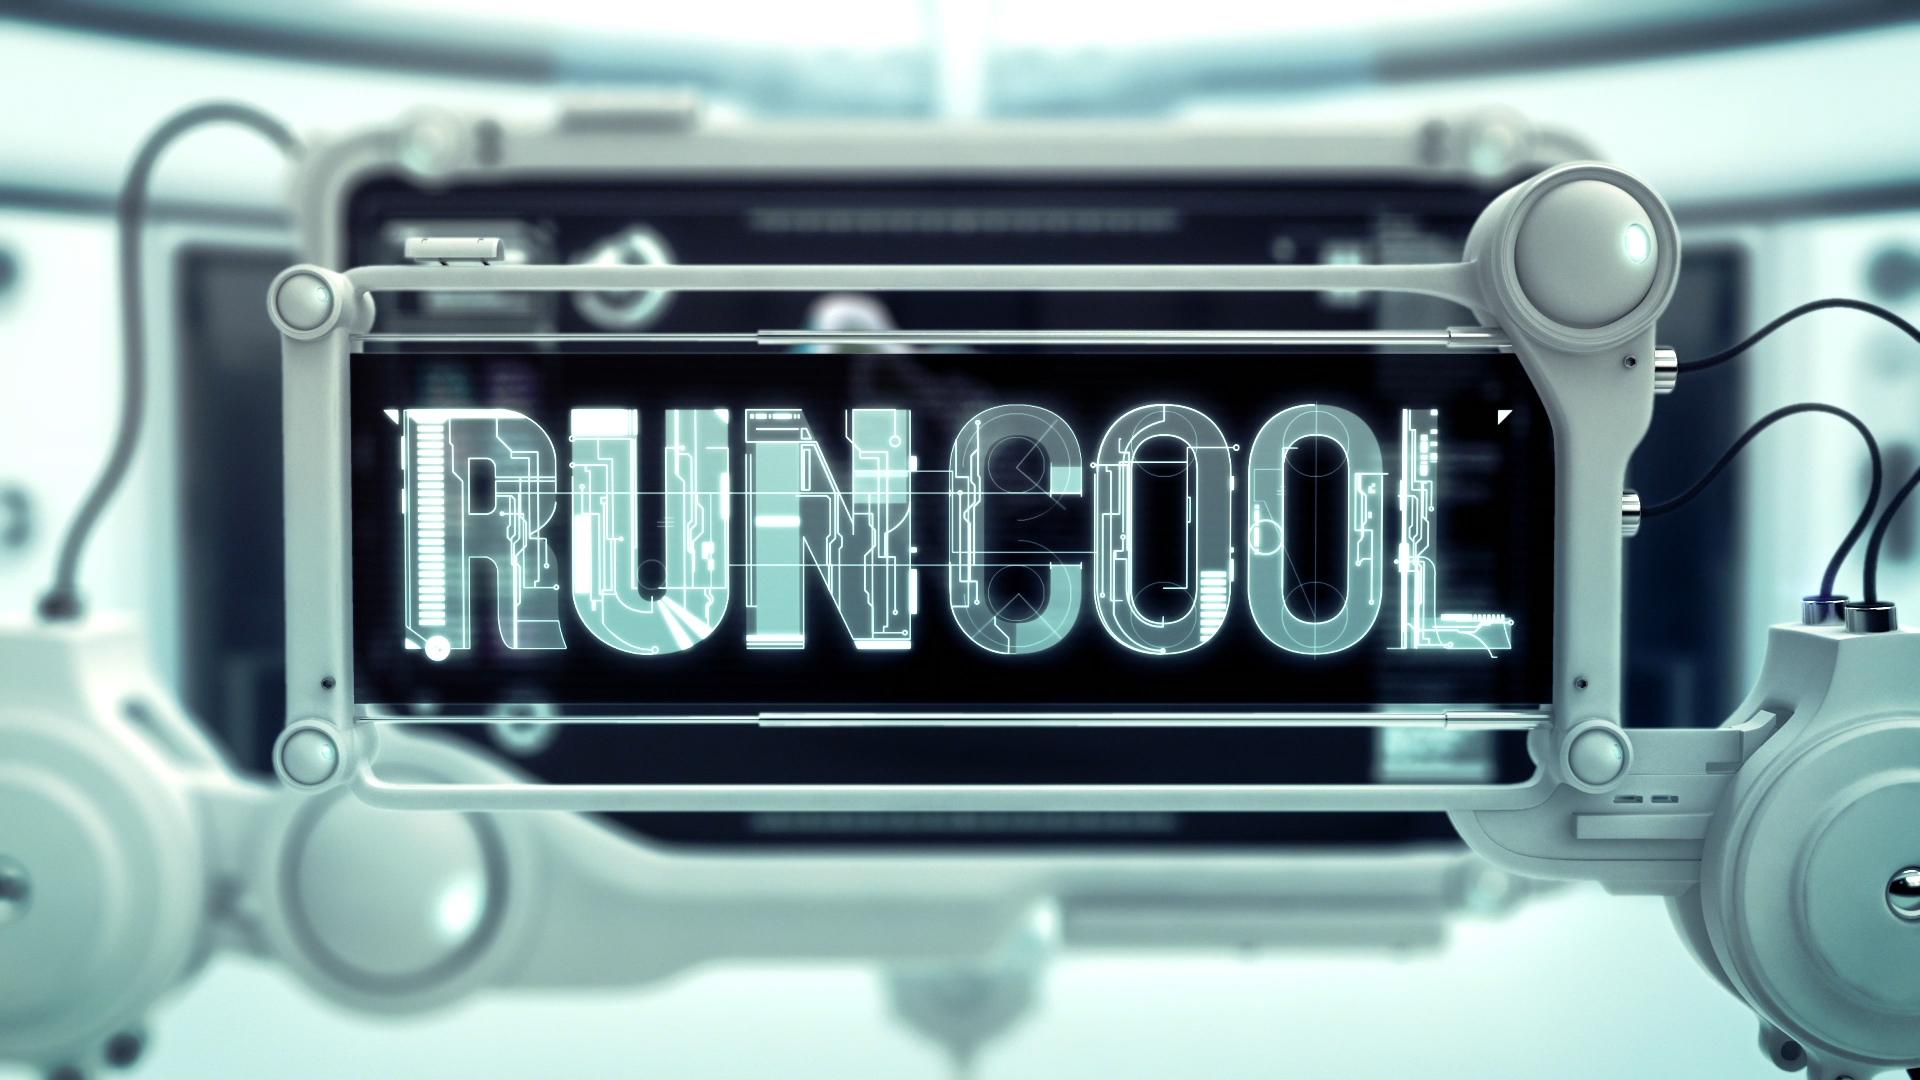 Nike_RunCool_050411_H264_v01 (00709).jpg